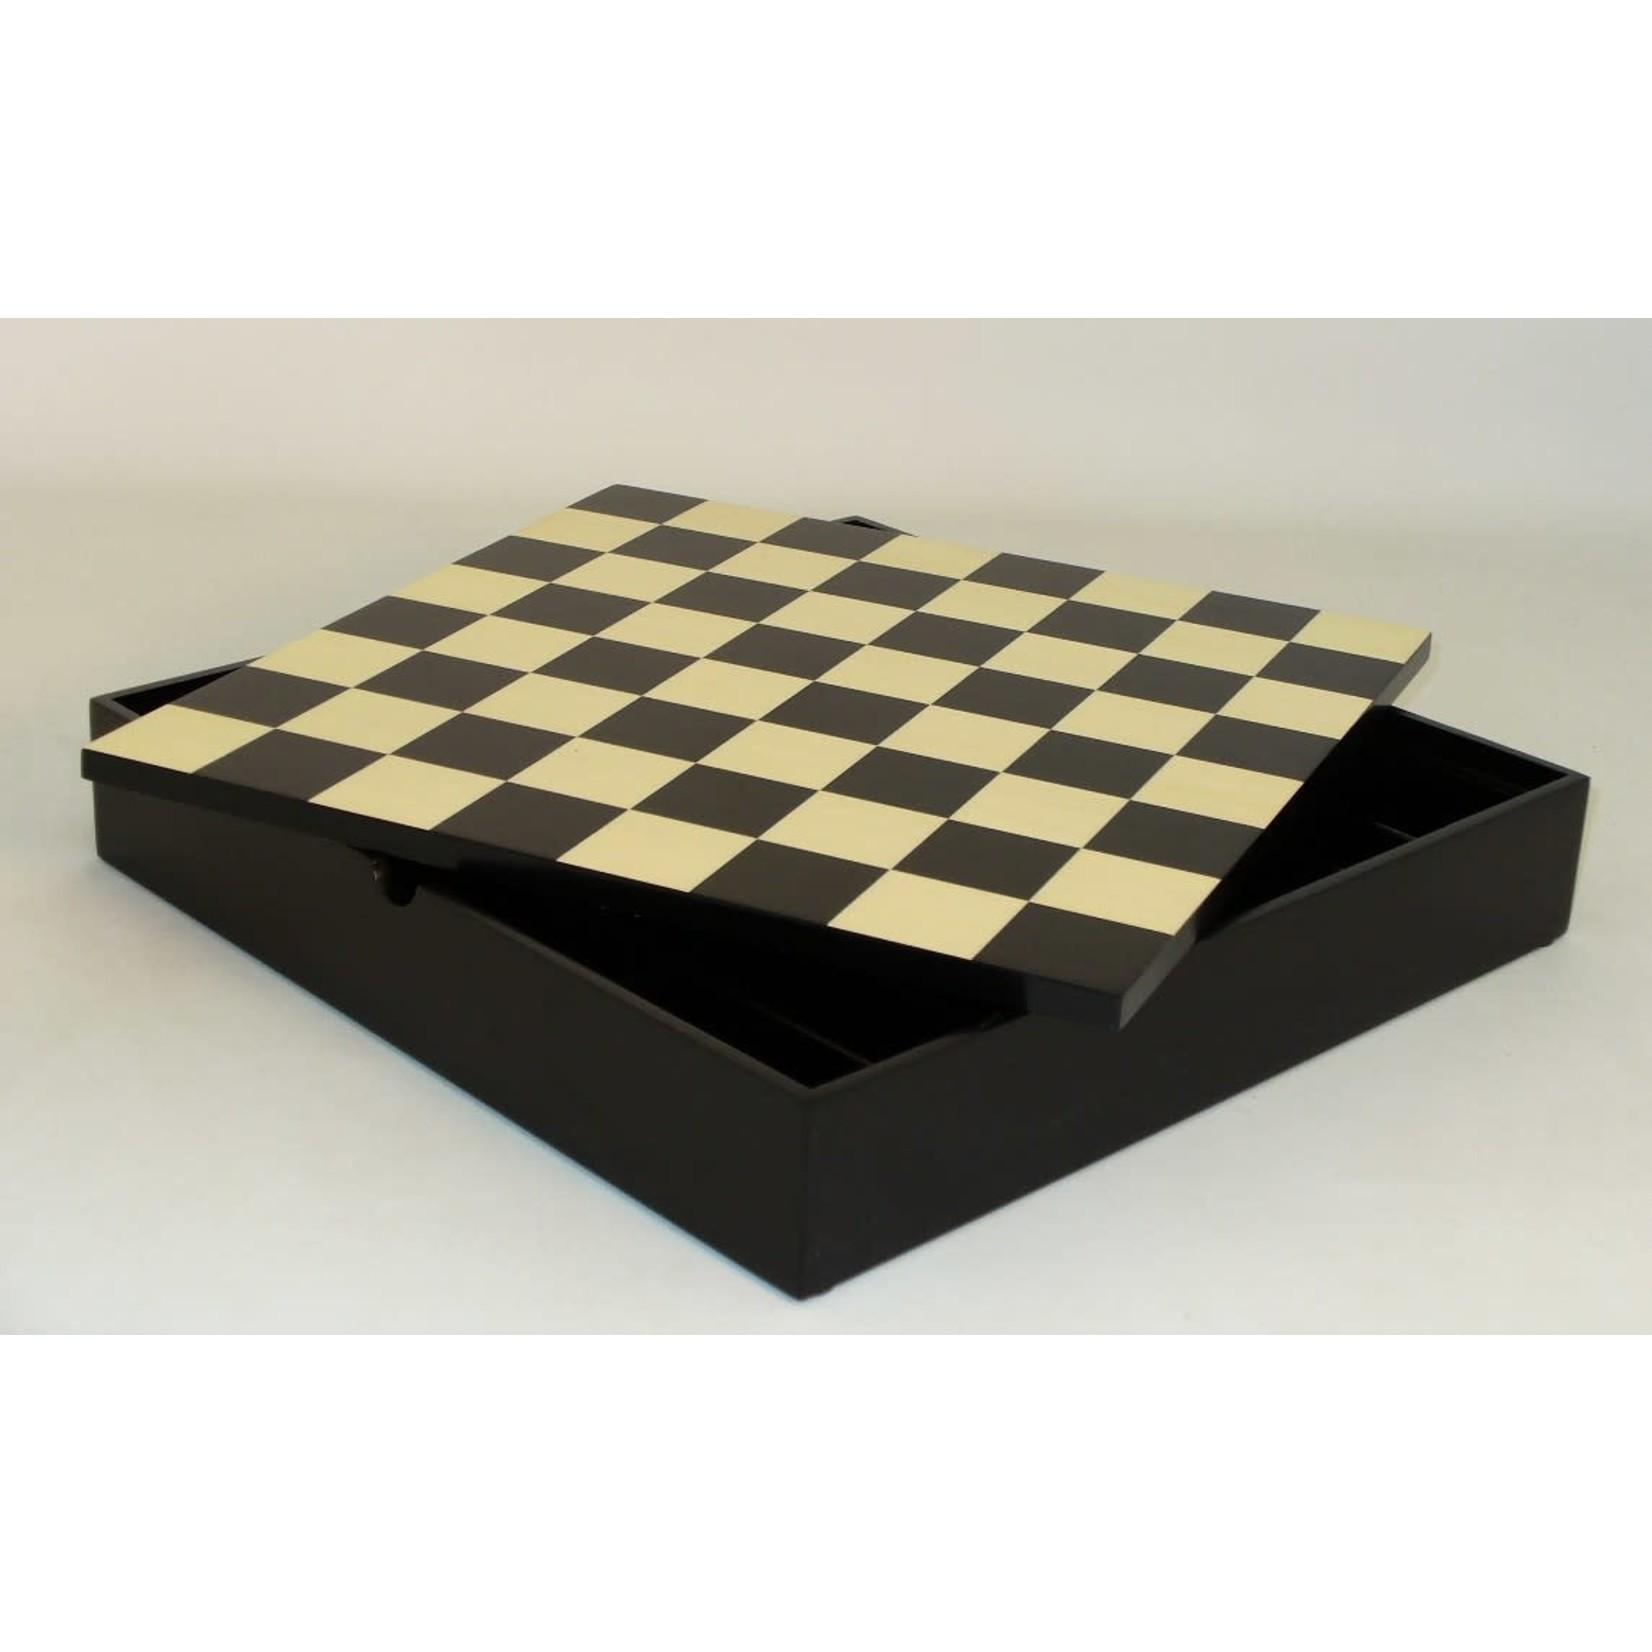 "WorldWise Imports Chess: 12"" Black Maple Veneer Chest"